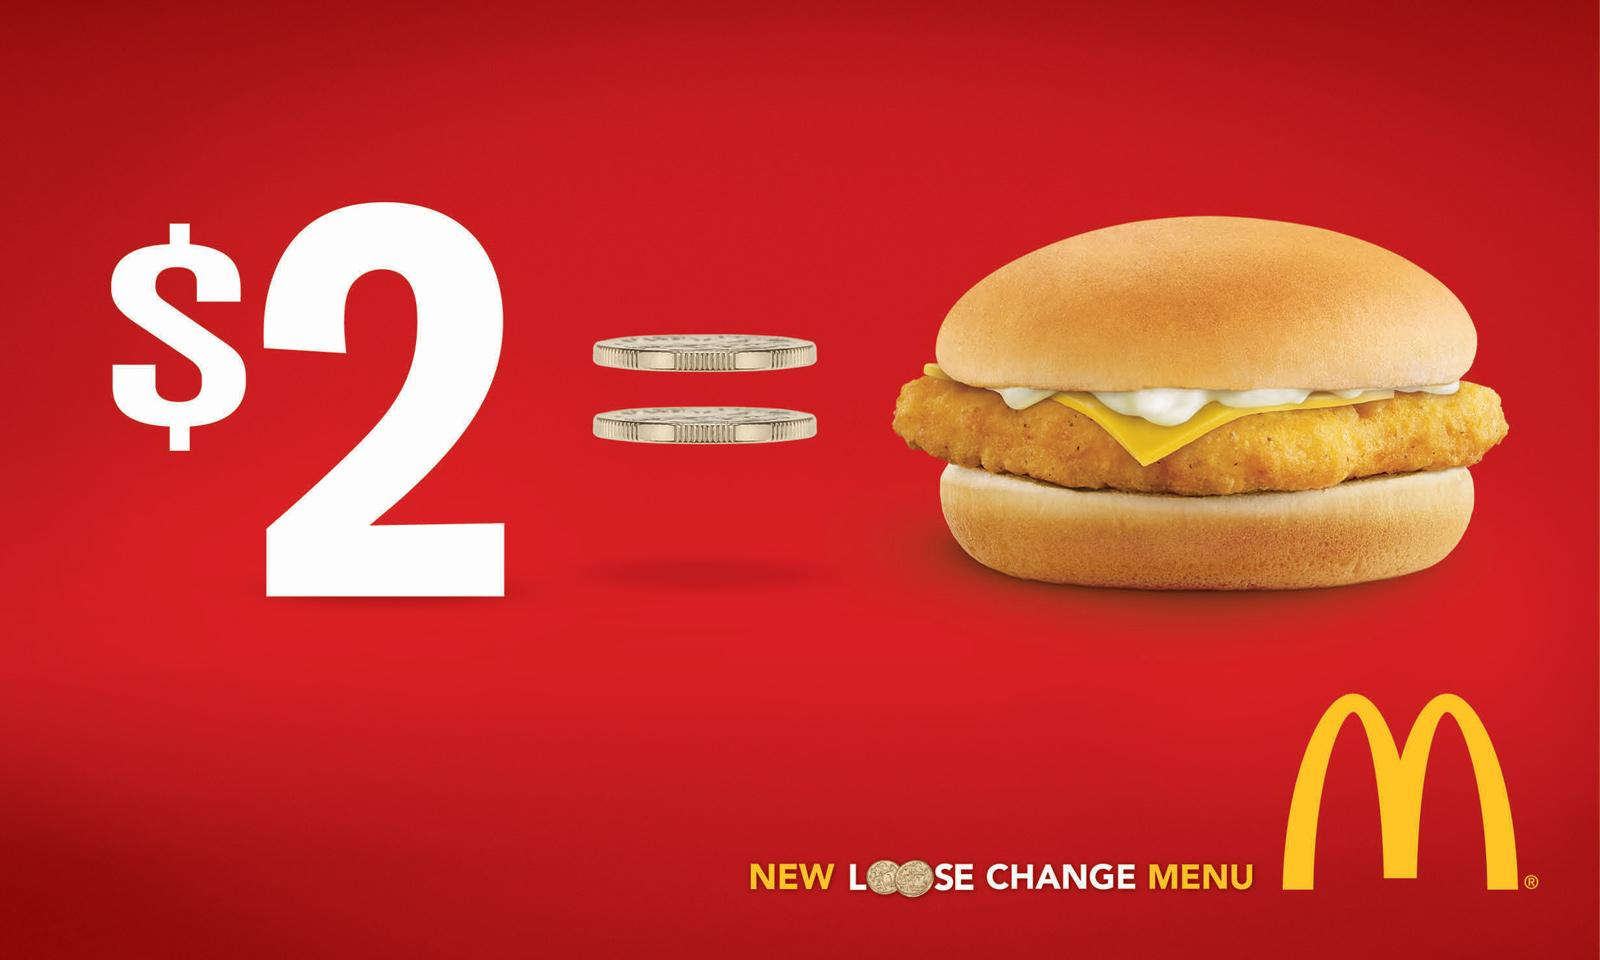 McDonald's Print Ad -  Loose Change, 1